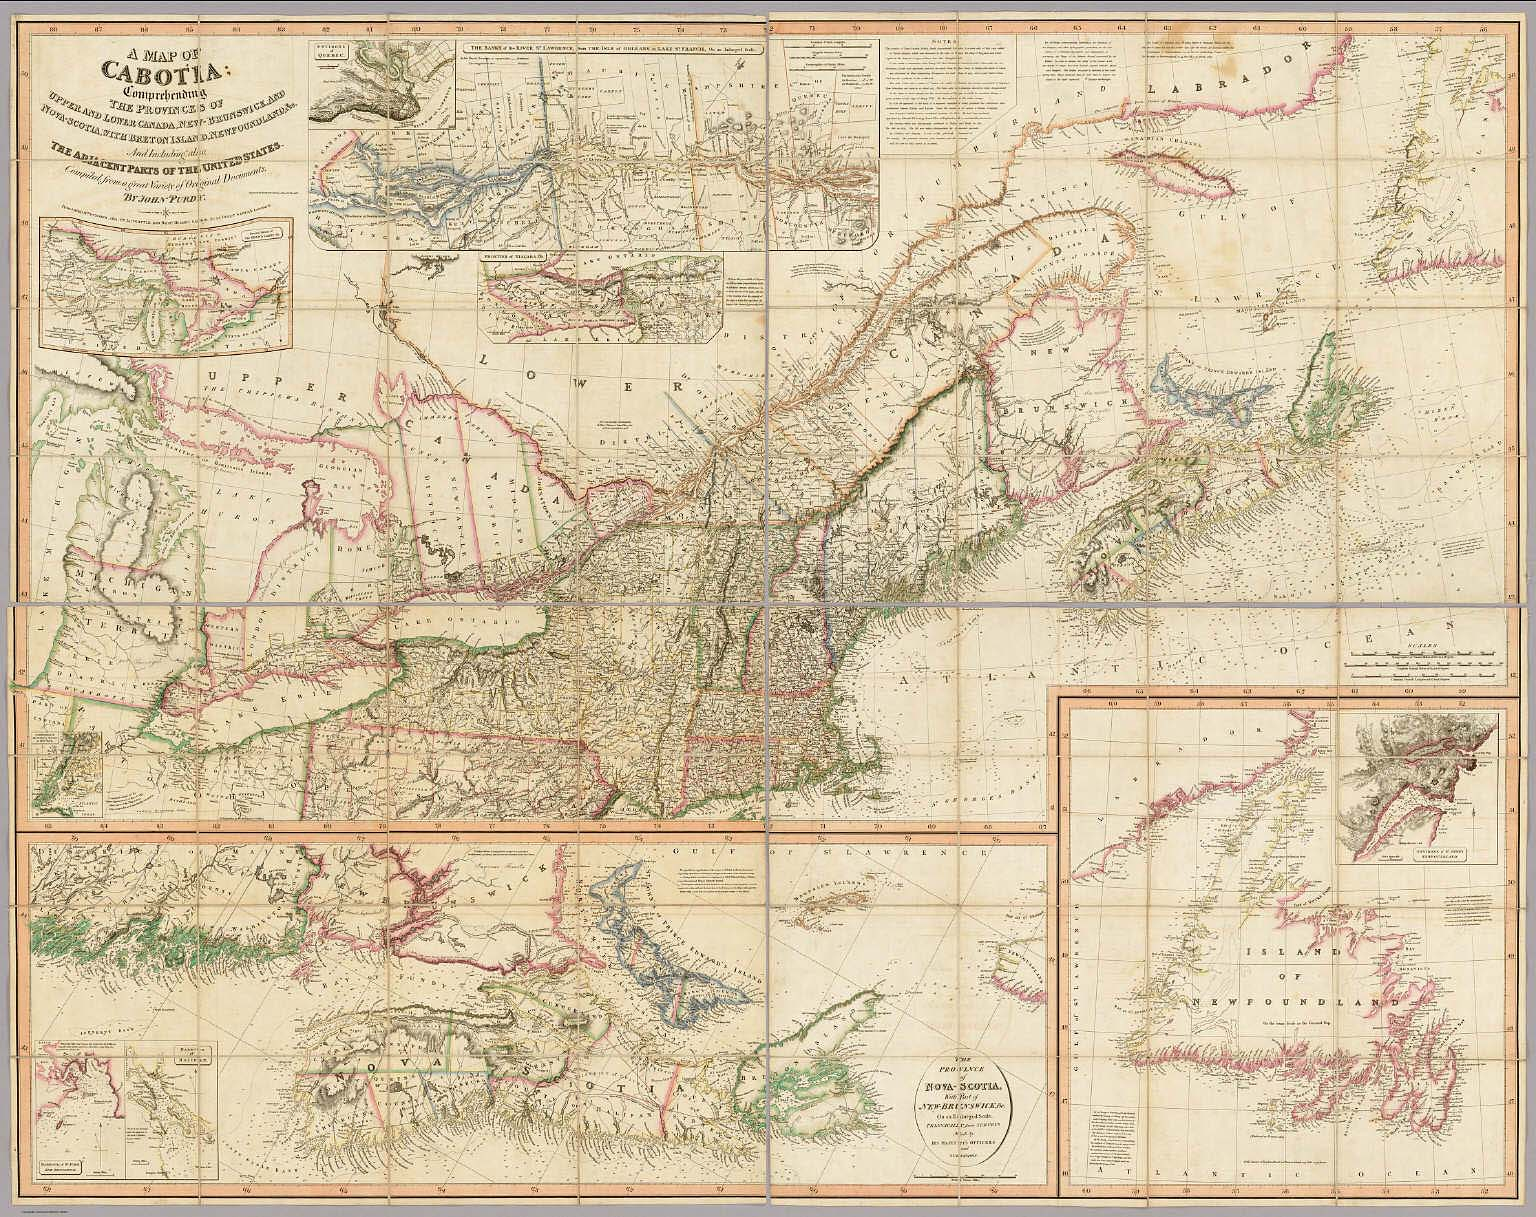 A Map Of Cabotia.